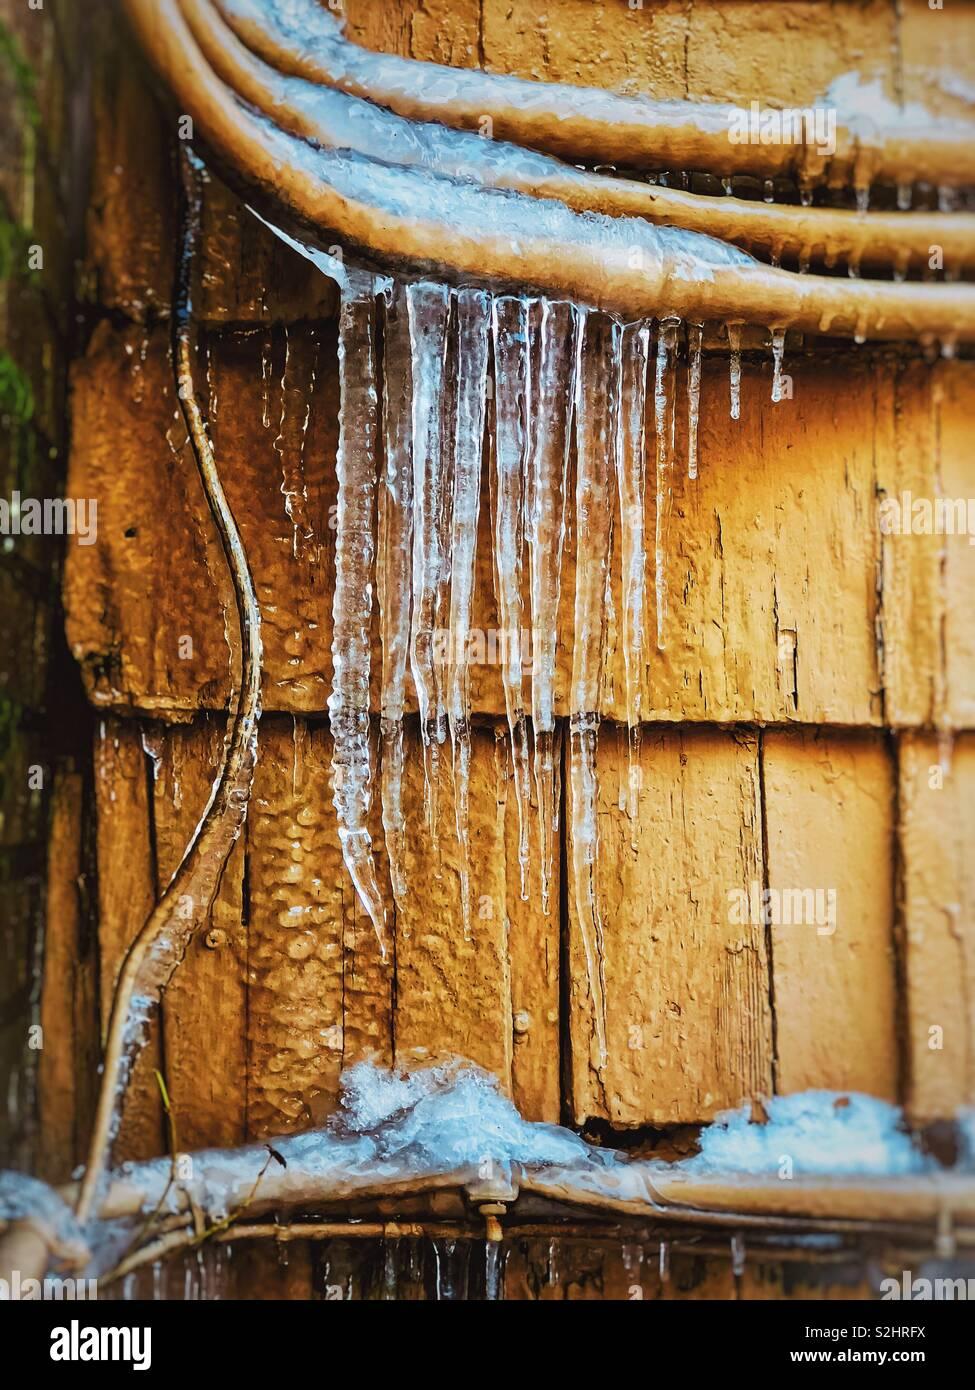 Midwest carámbanos de invierno , Fort Wayne, Indiana. Imagen De Stock